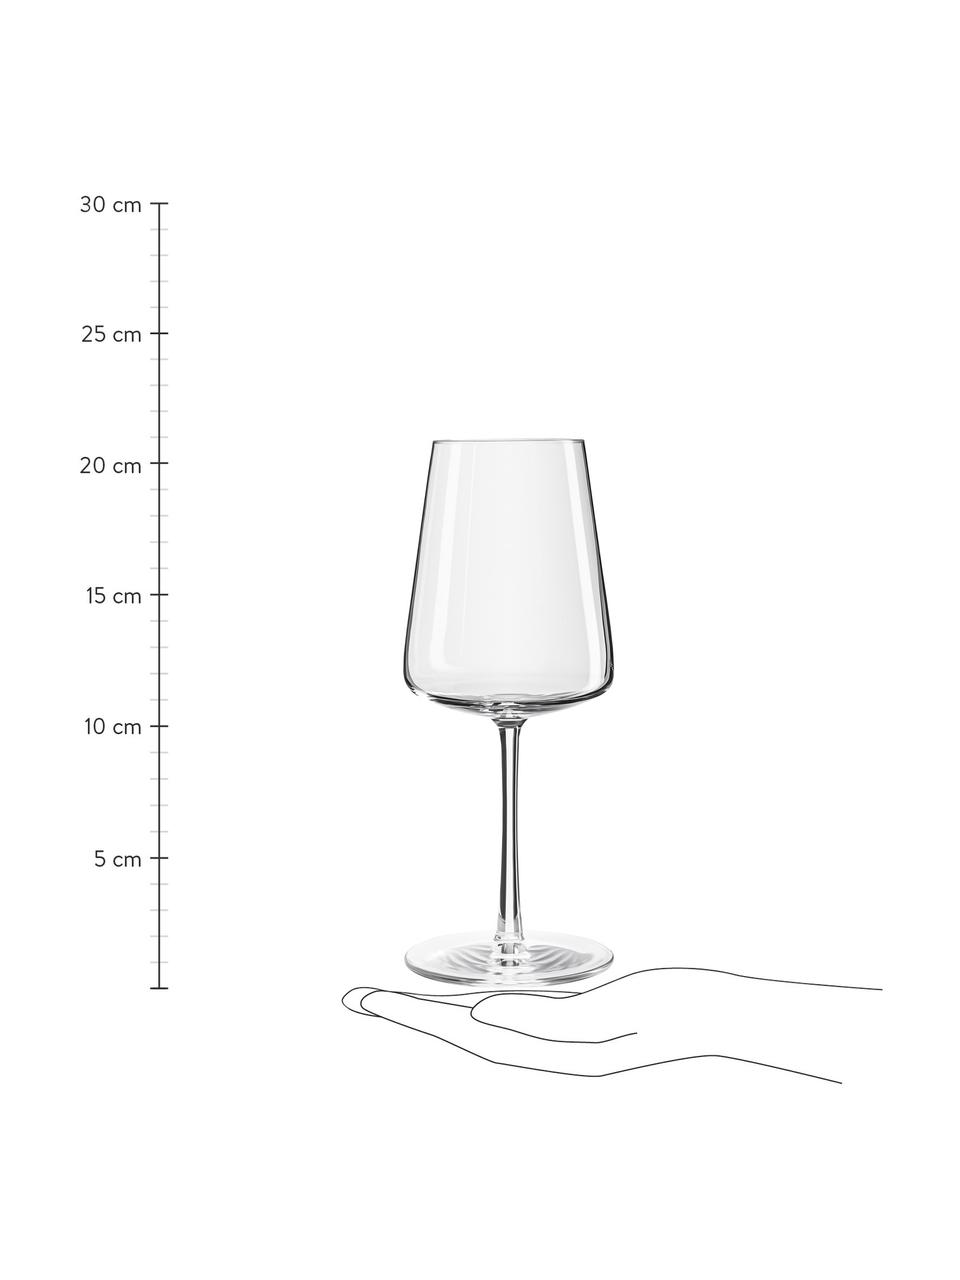 Kristall-Weißweingläser Power in Kegelform, 6 Stück, Kristallglas, Transparent, Ø 9 x H 21 cm